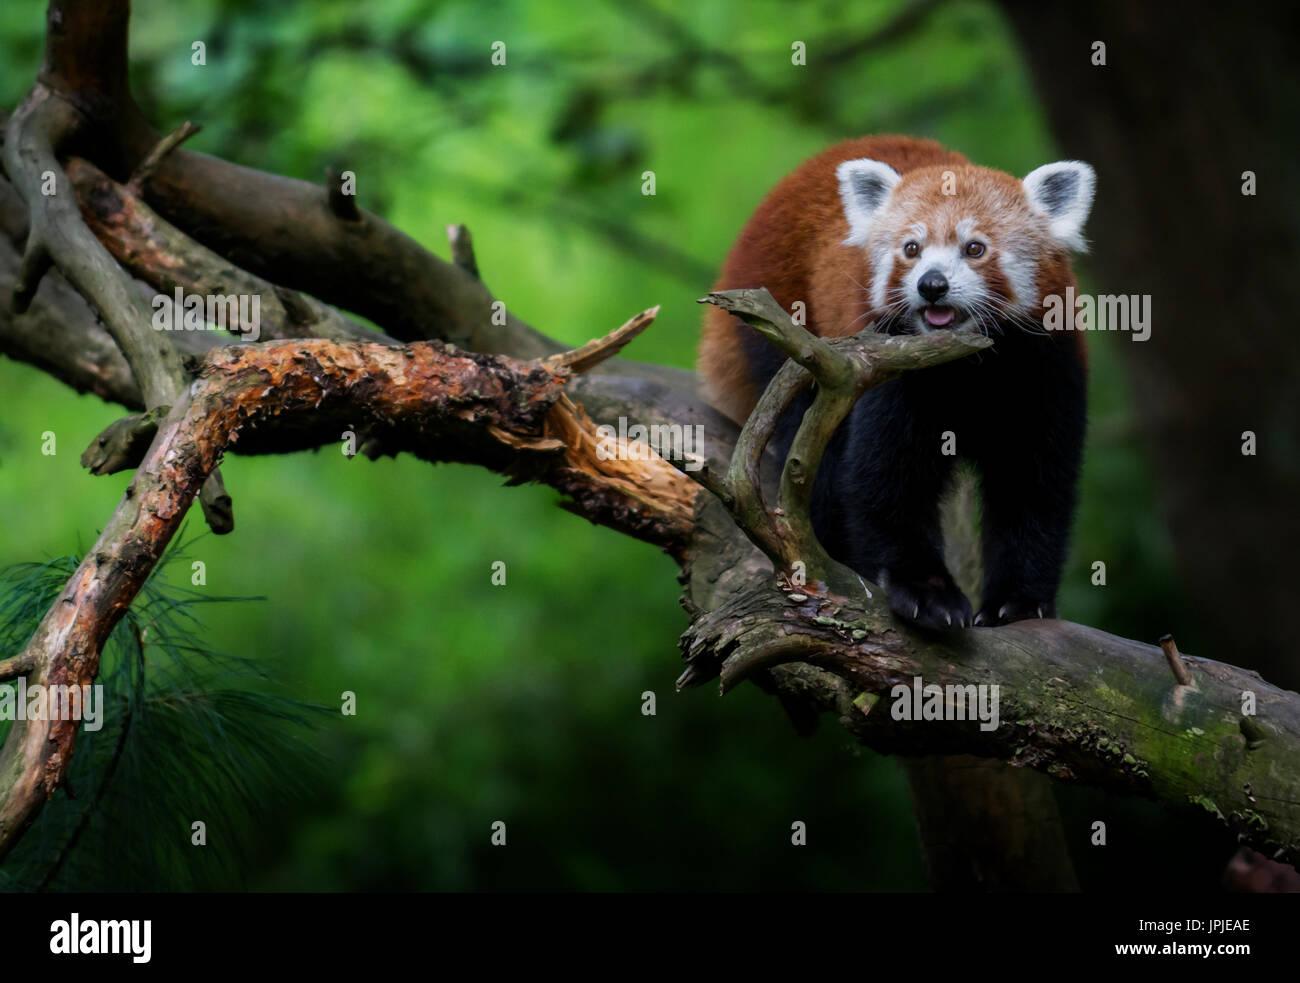 Lindo panda rojo (Ailurus fulgens) en el árbol Foto de stock